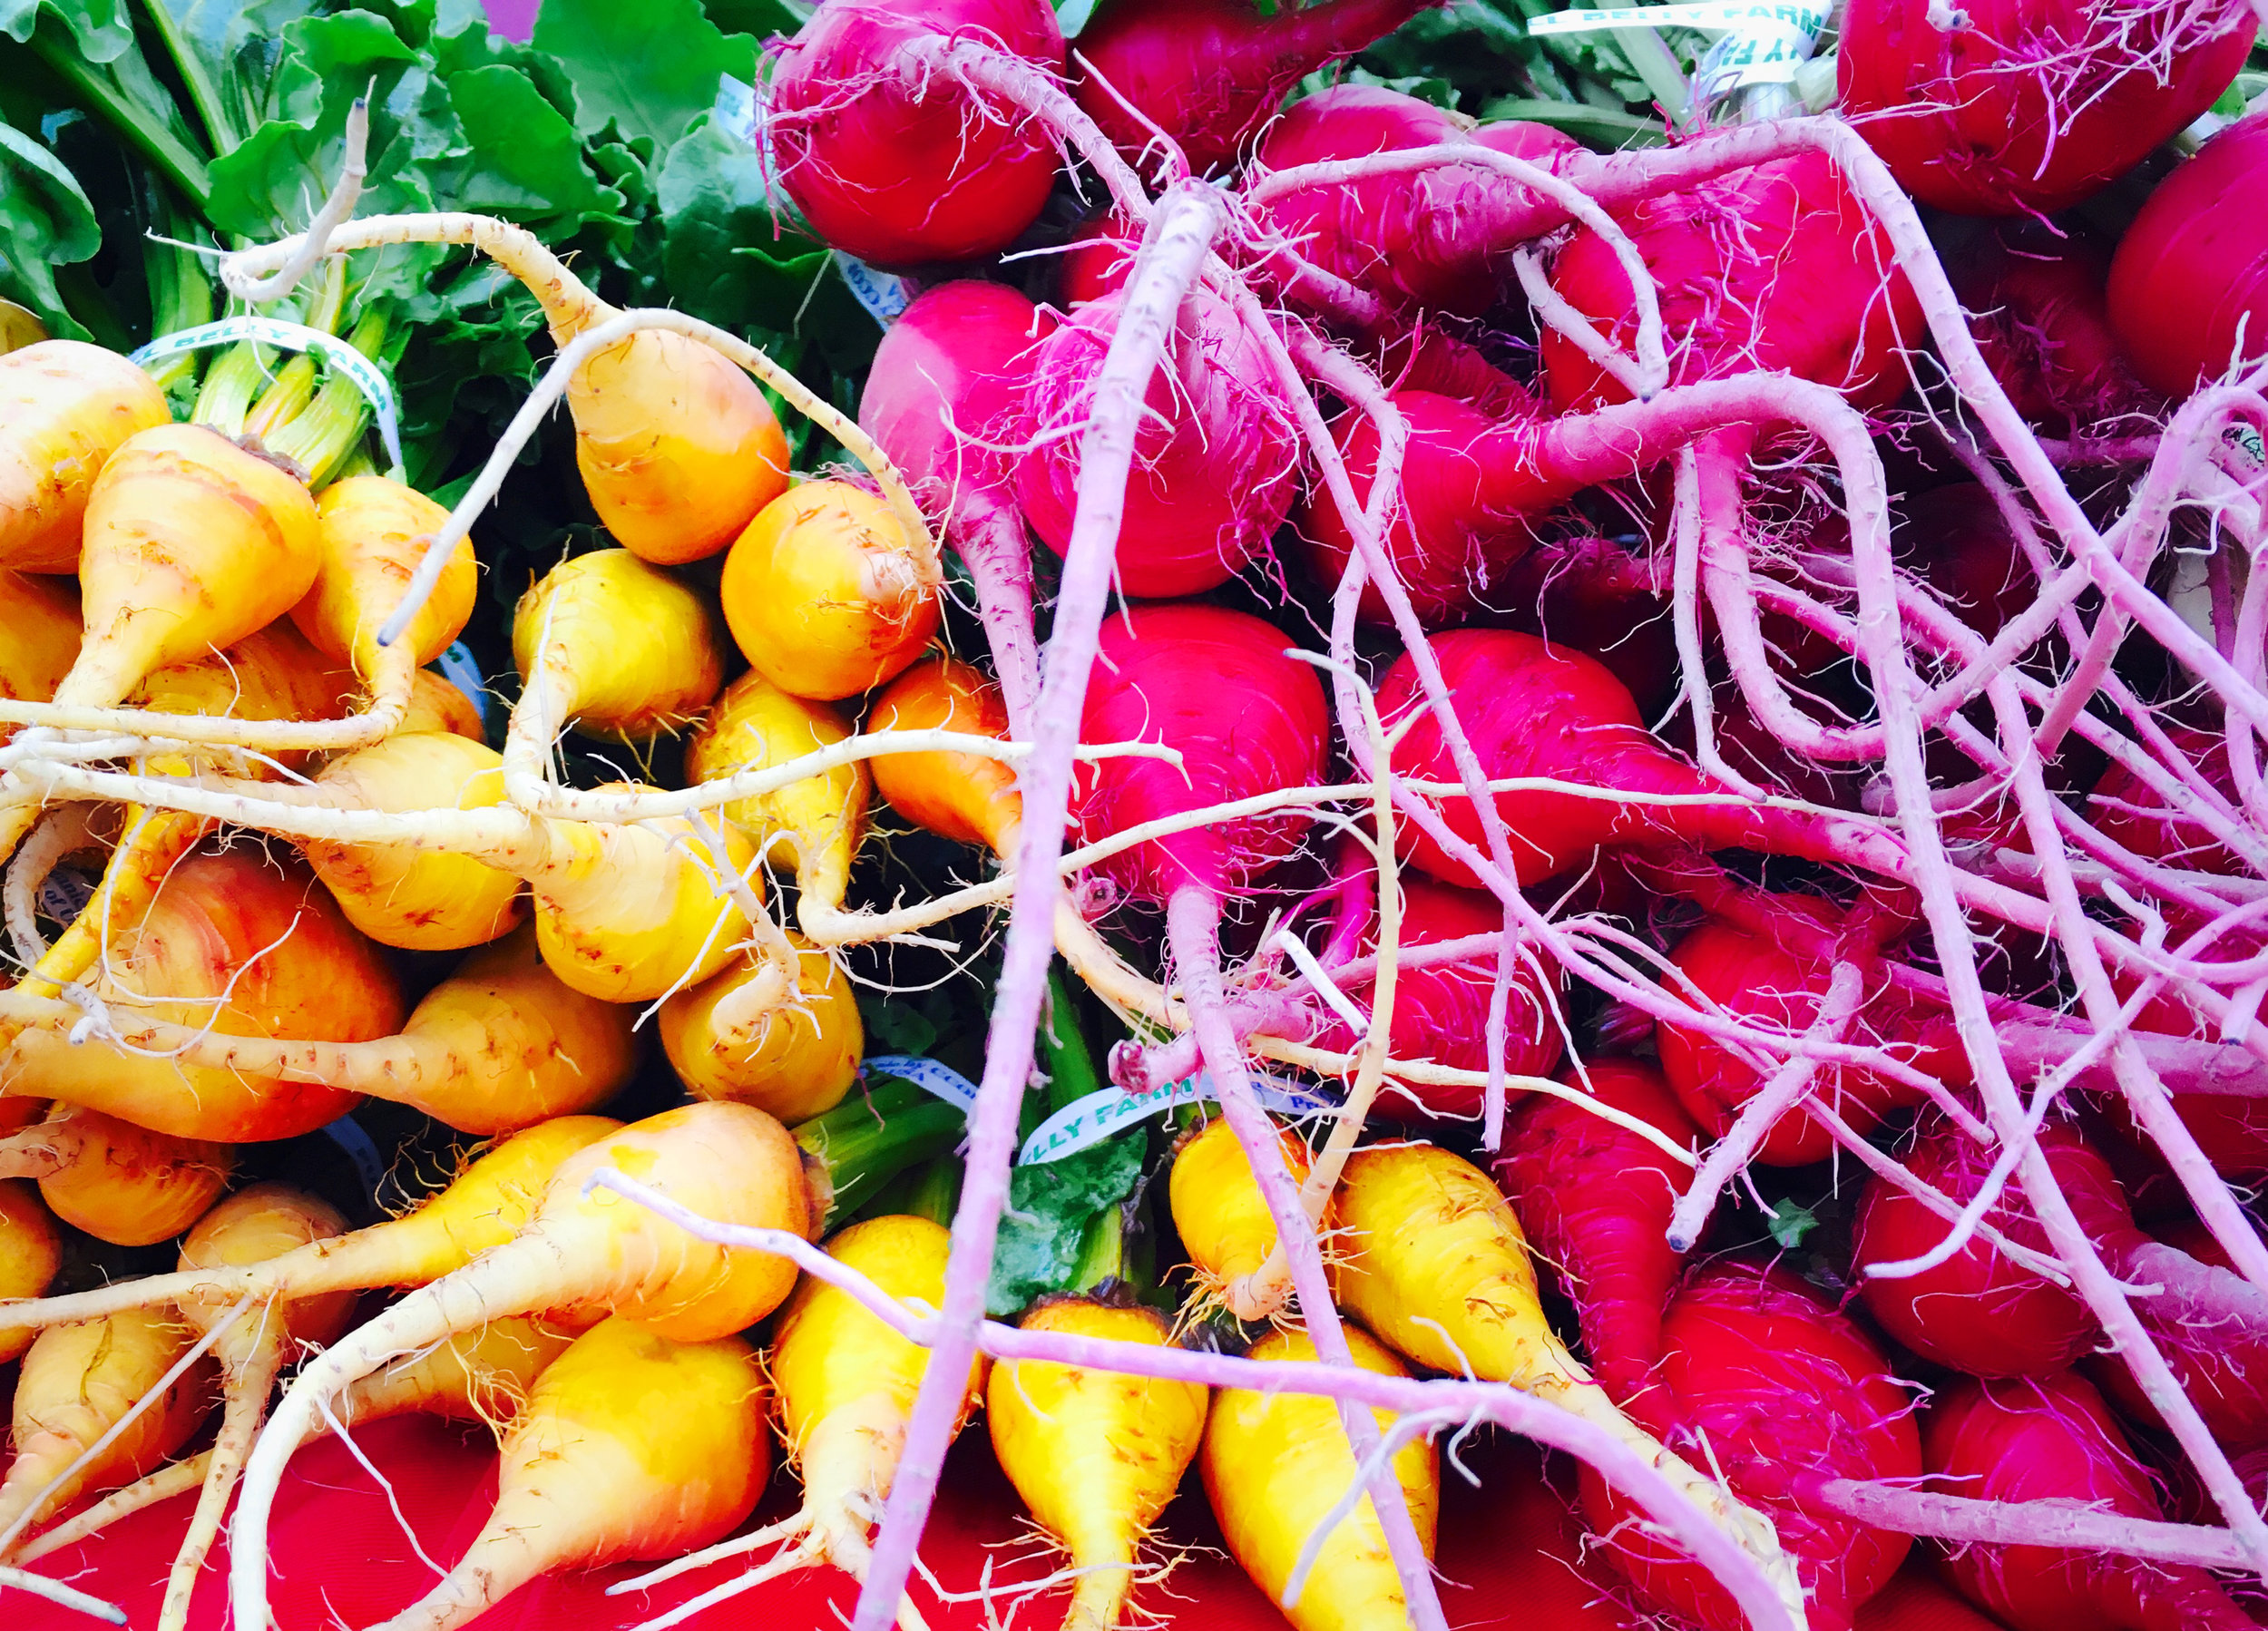 rainbow-beets-1.jpg